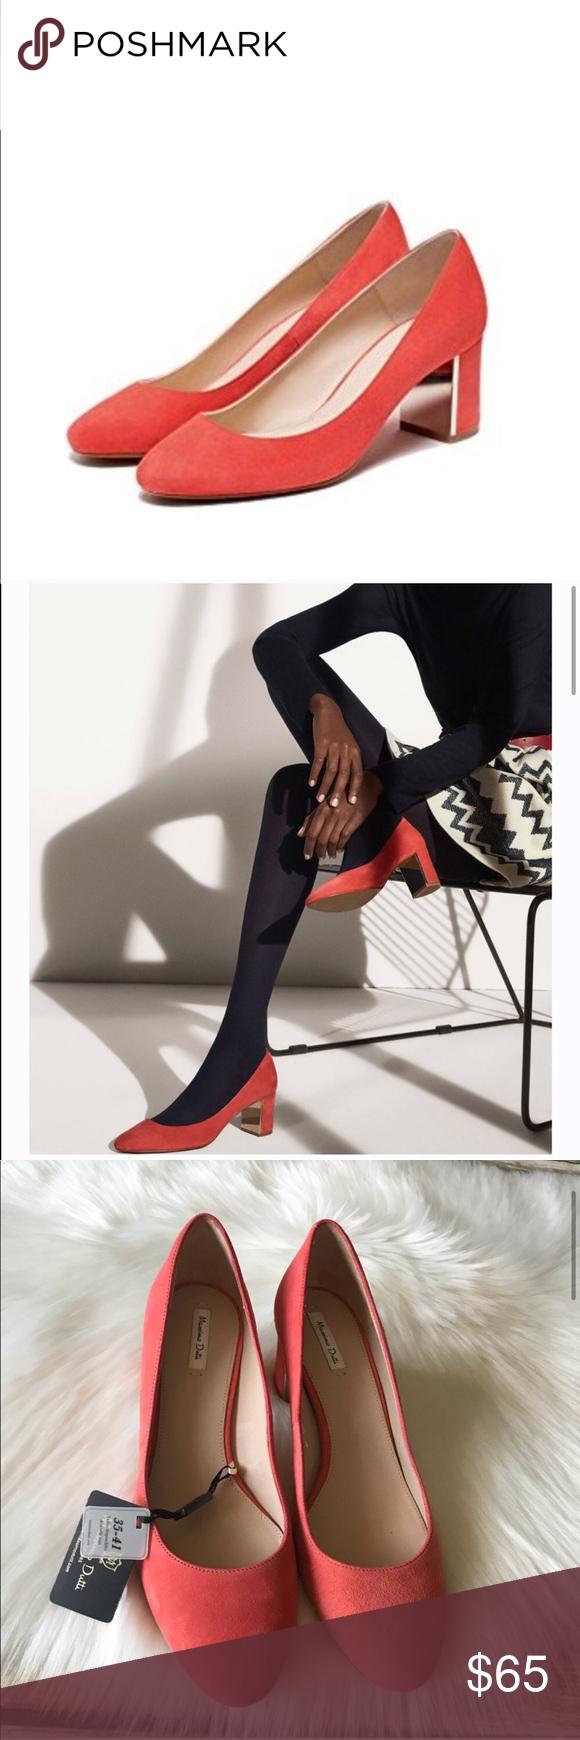 New Massino Dutti Heels Shoes Chunky Heel